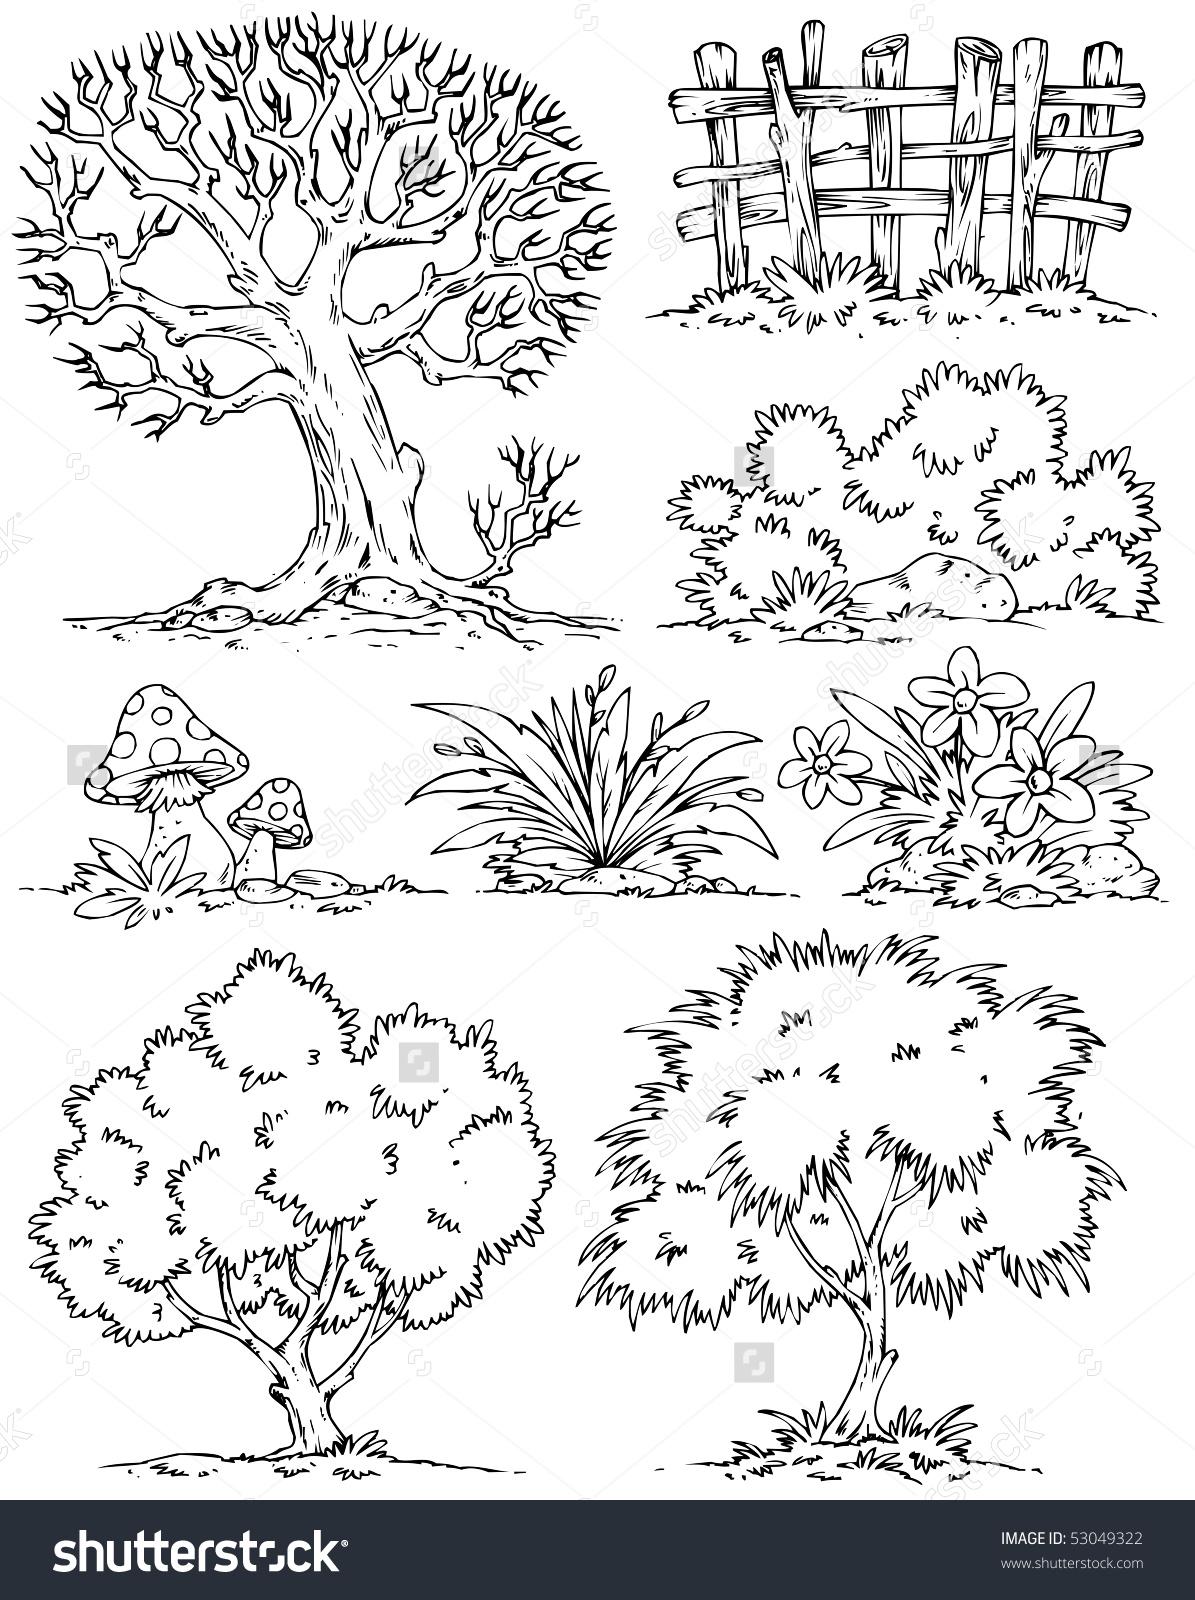 Bush tree clipart black and white.